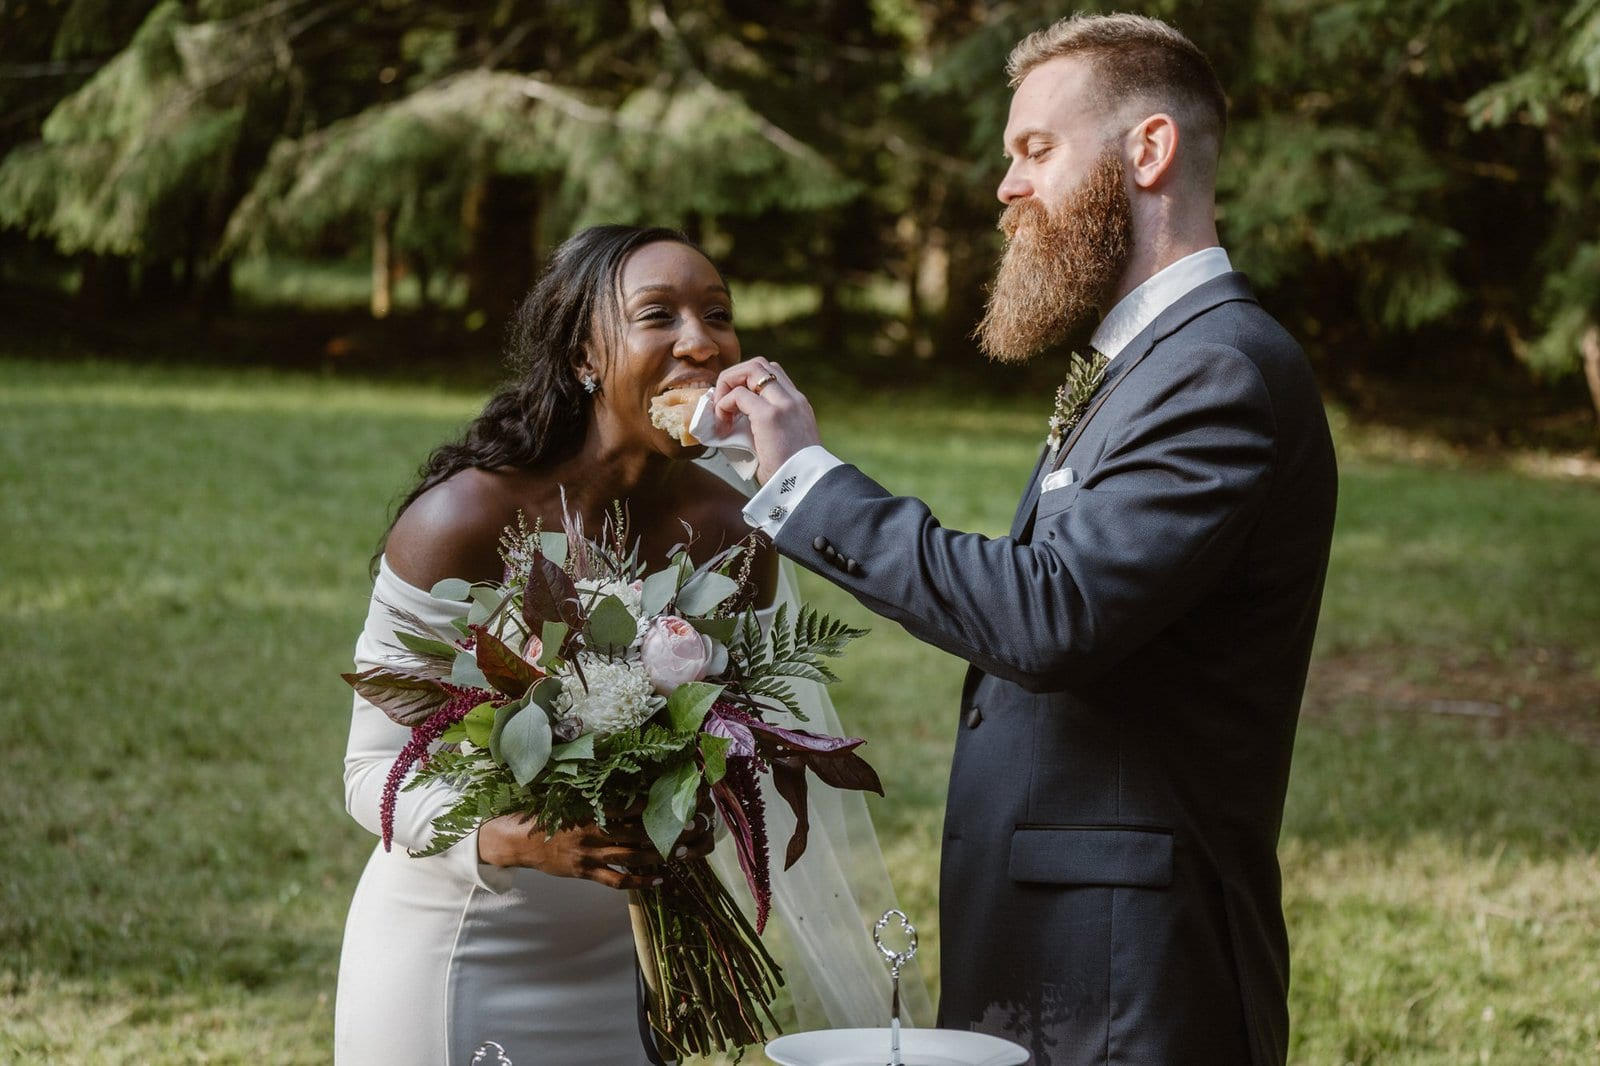 groom feeds bride donuts during intimate wedding.